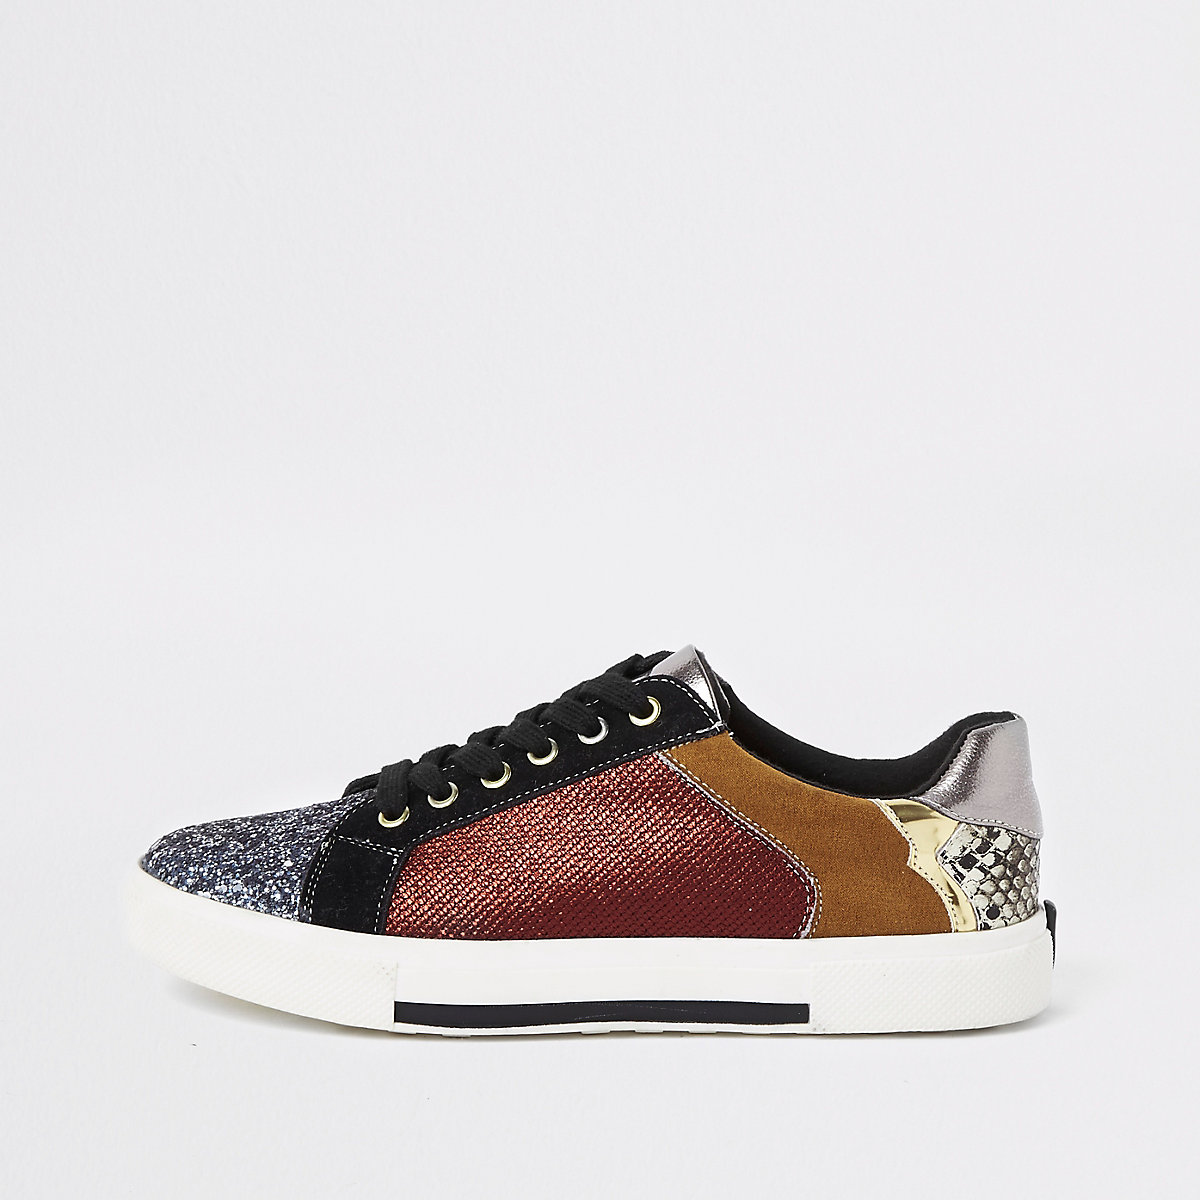 Donkerrode vetersneakers met glitter